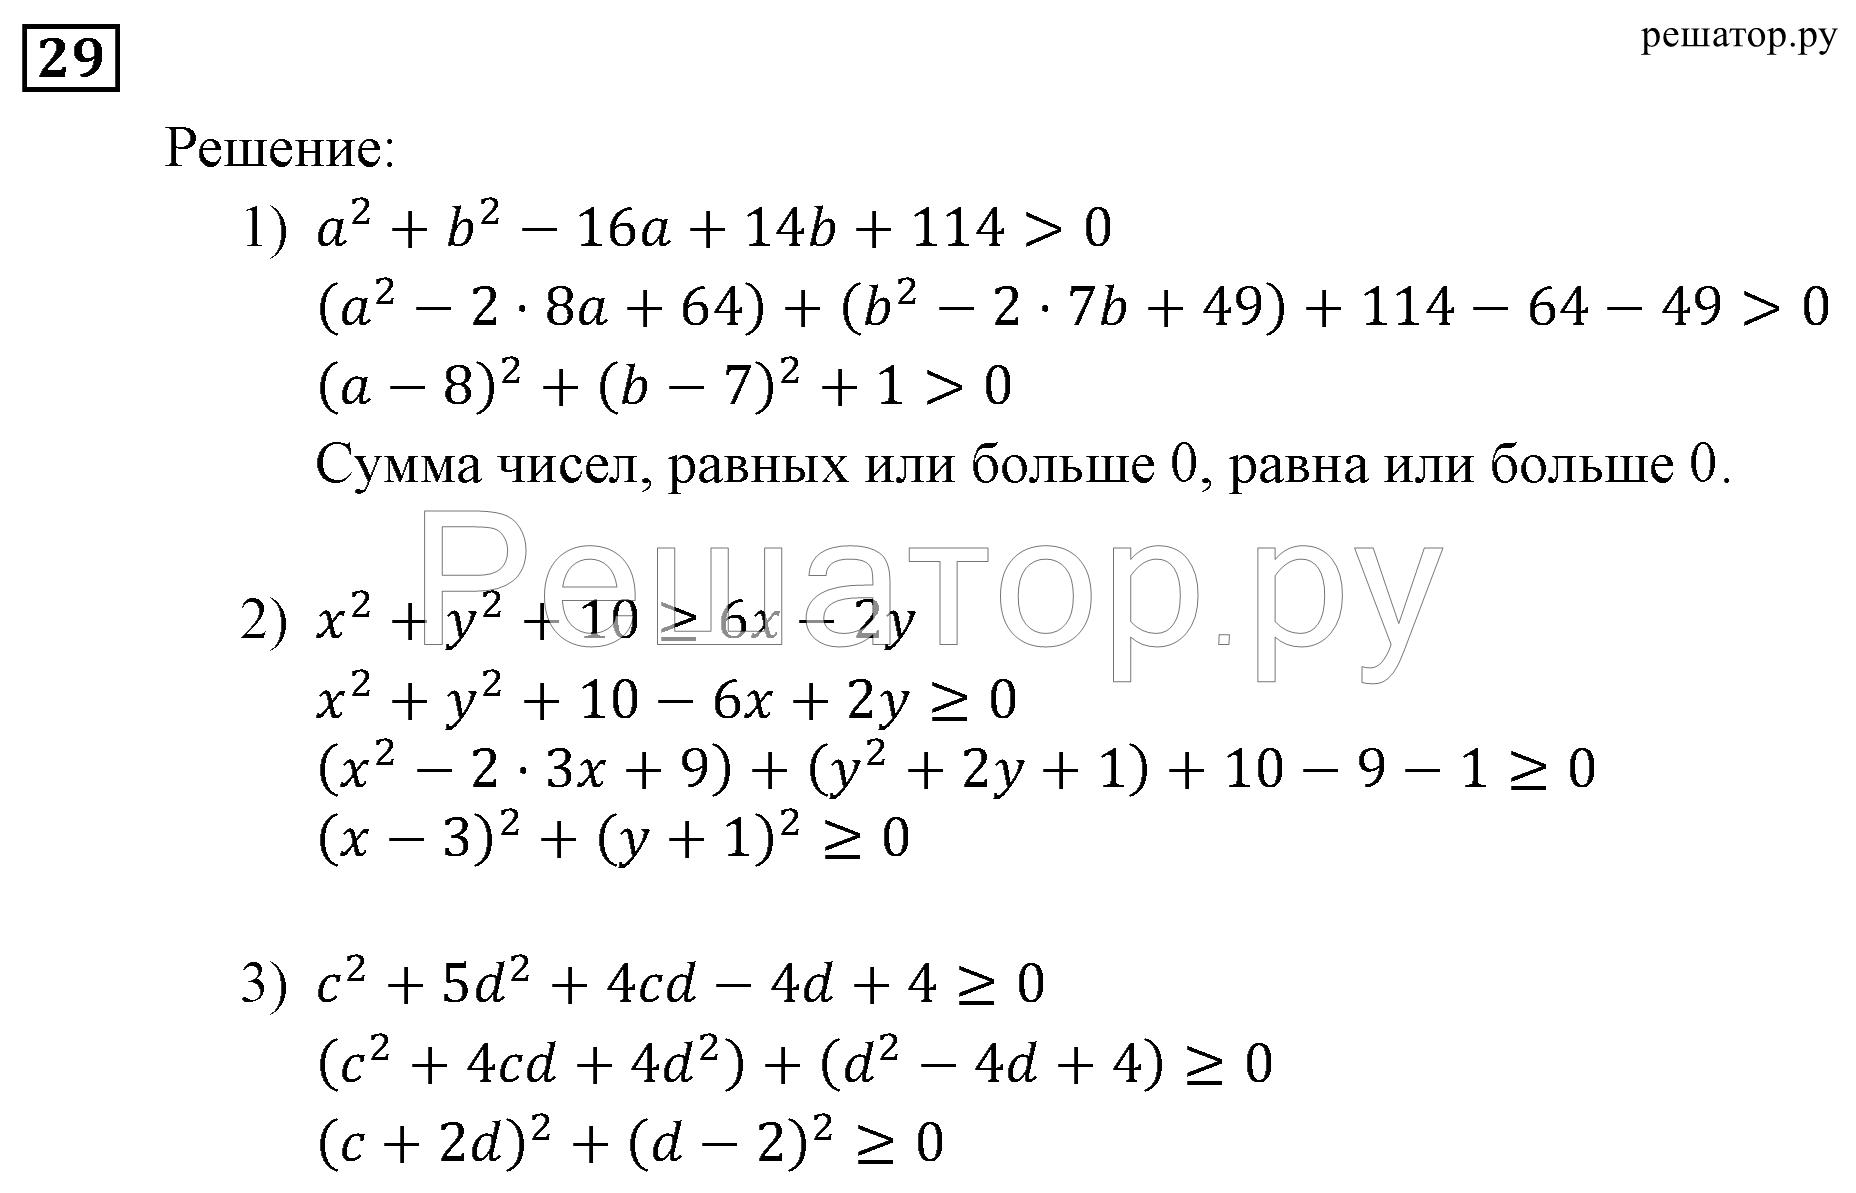 Решебник По Алгебре 9 Класс Мерзляк Учебник